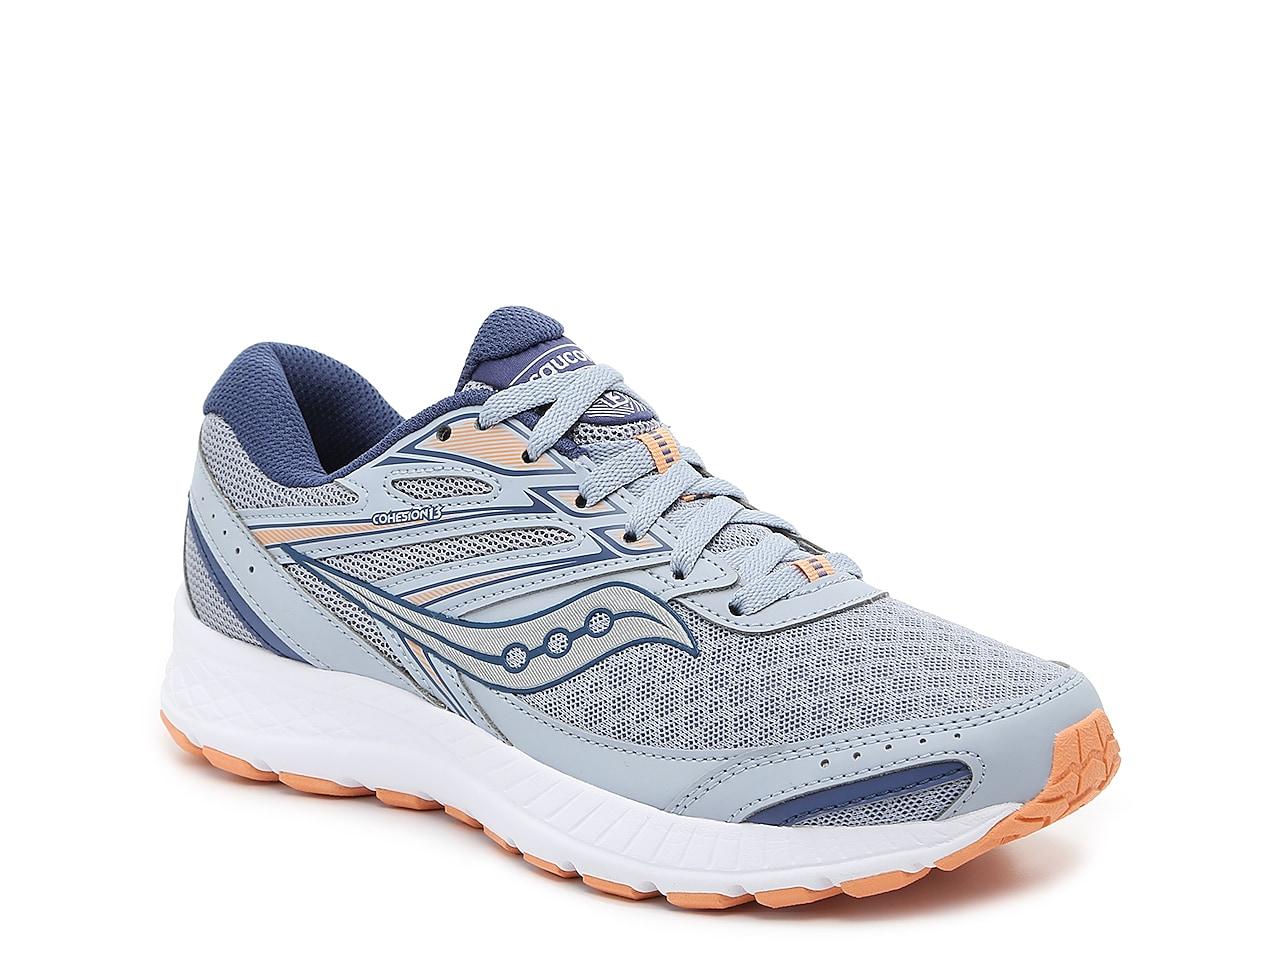 Cohesion 13 Running Shoe - Women's